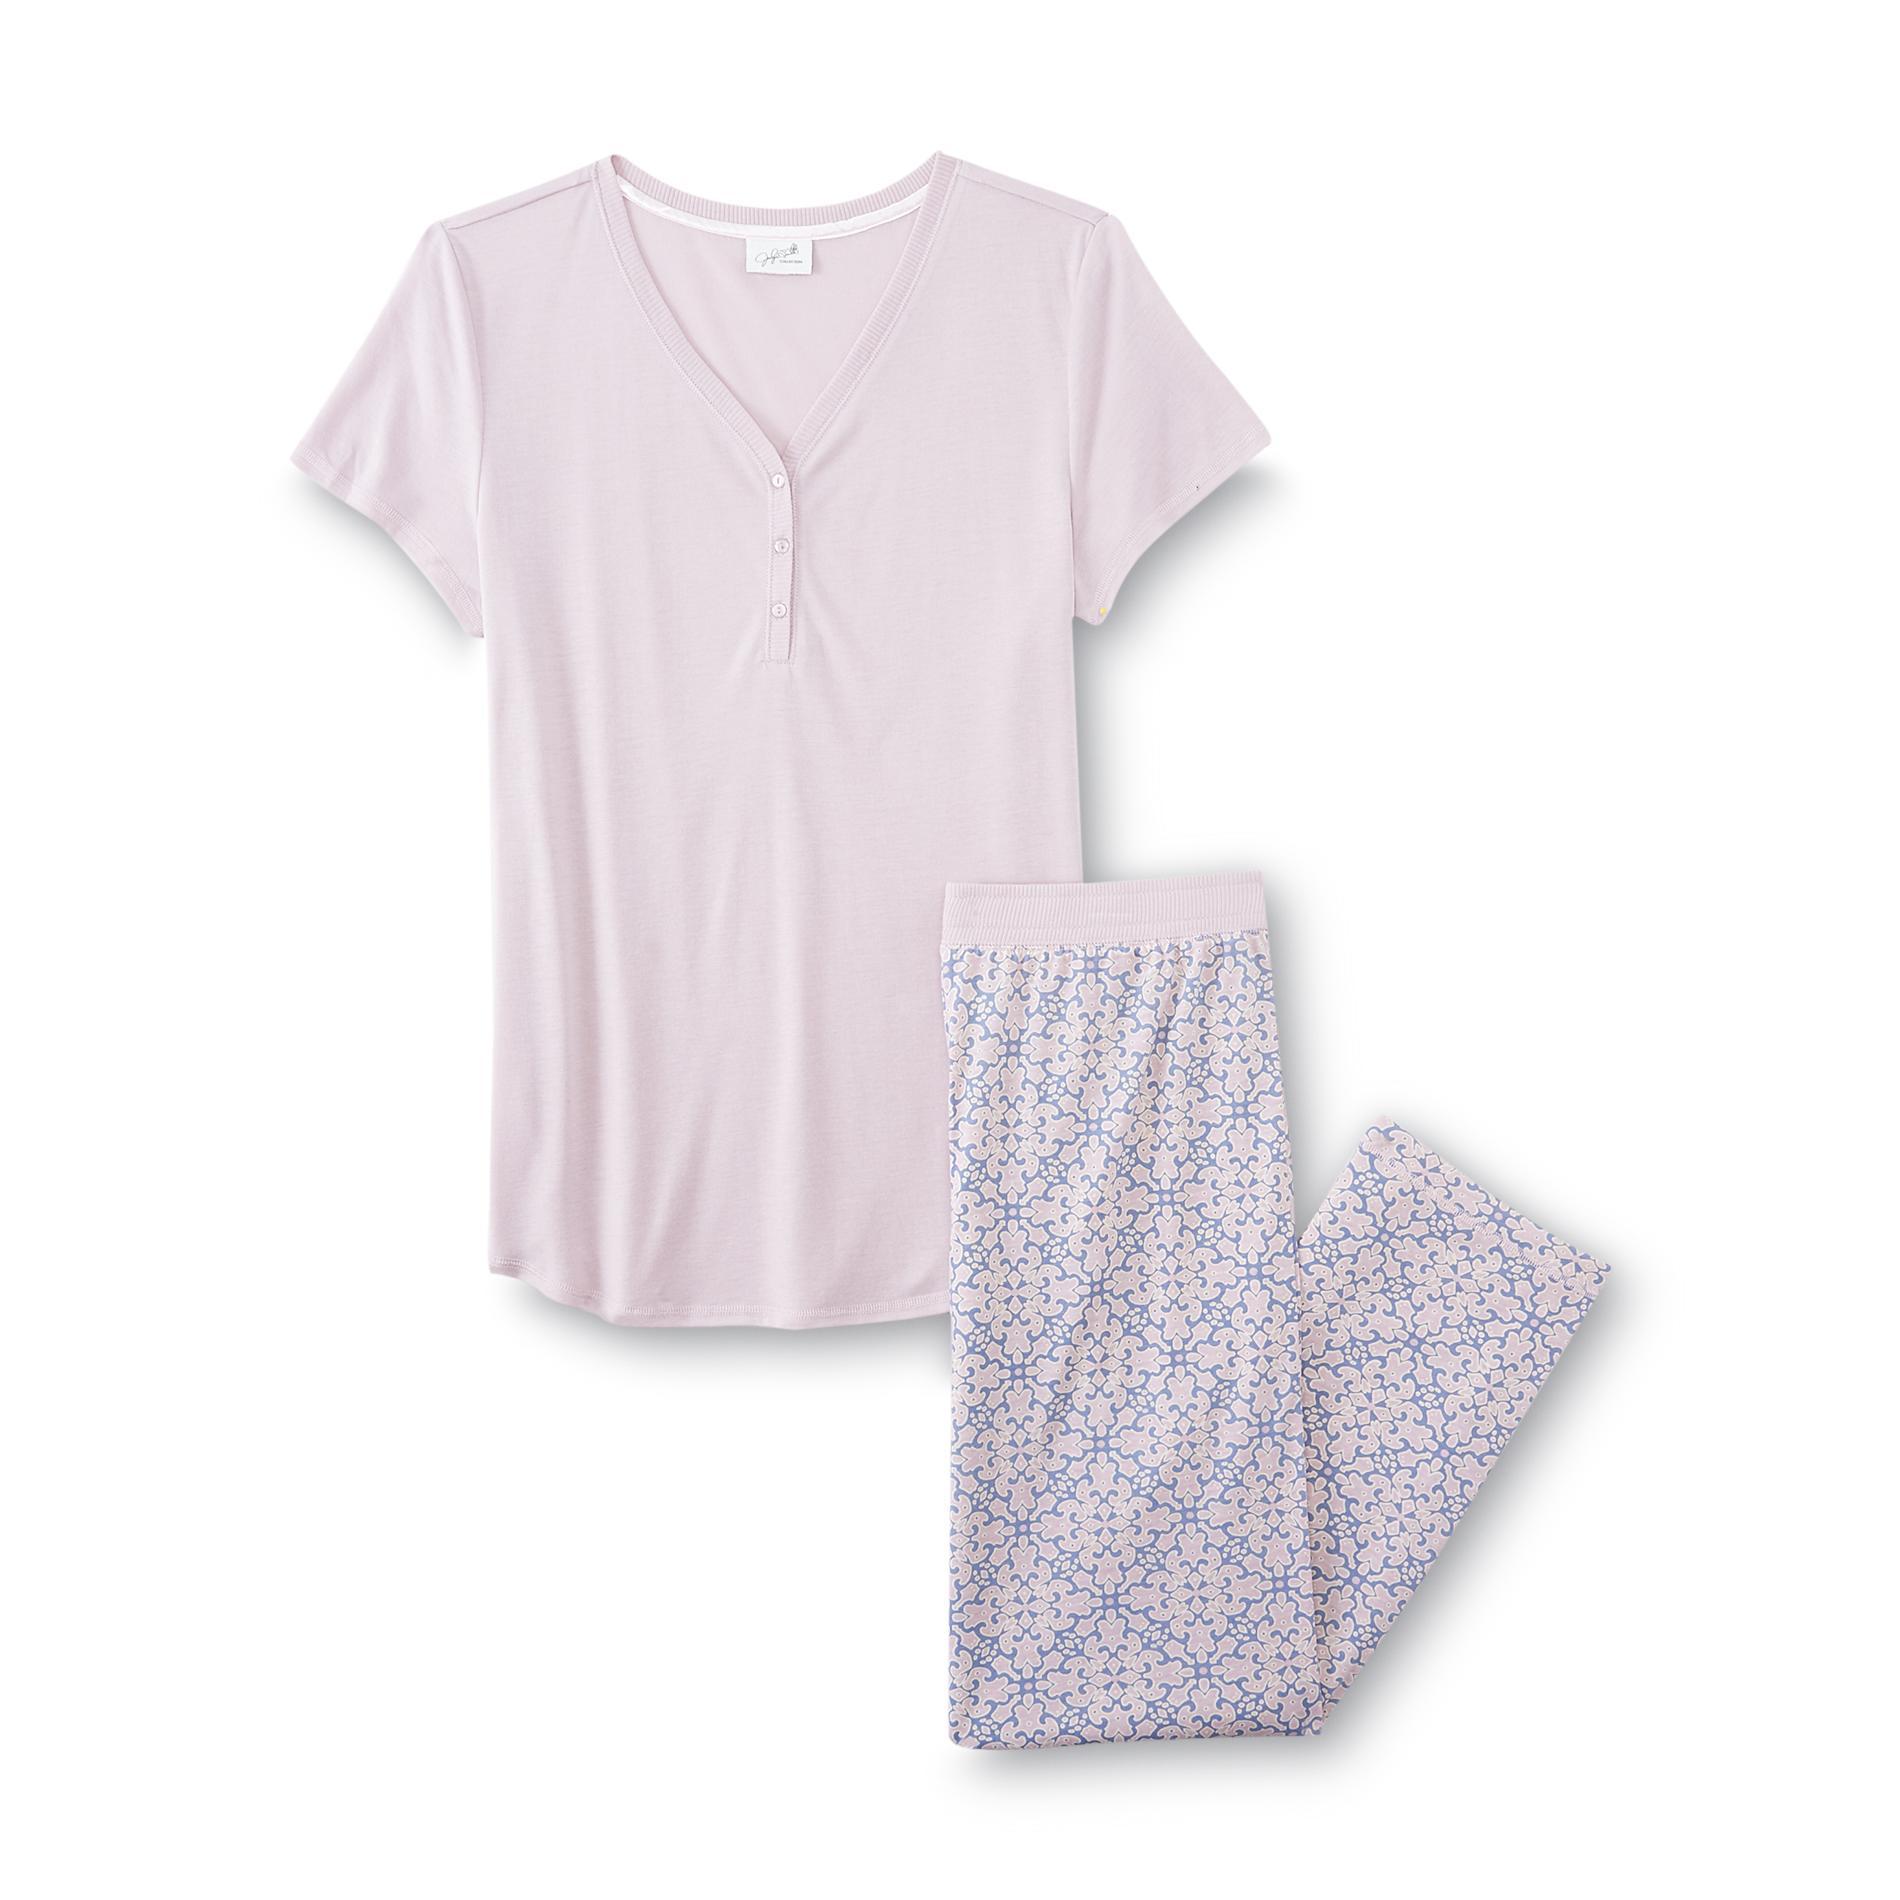 Jaclyn smith women 39 s flannel pajama shirt pants dream for Women s flannel sleep shirt